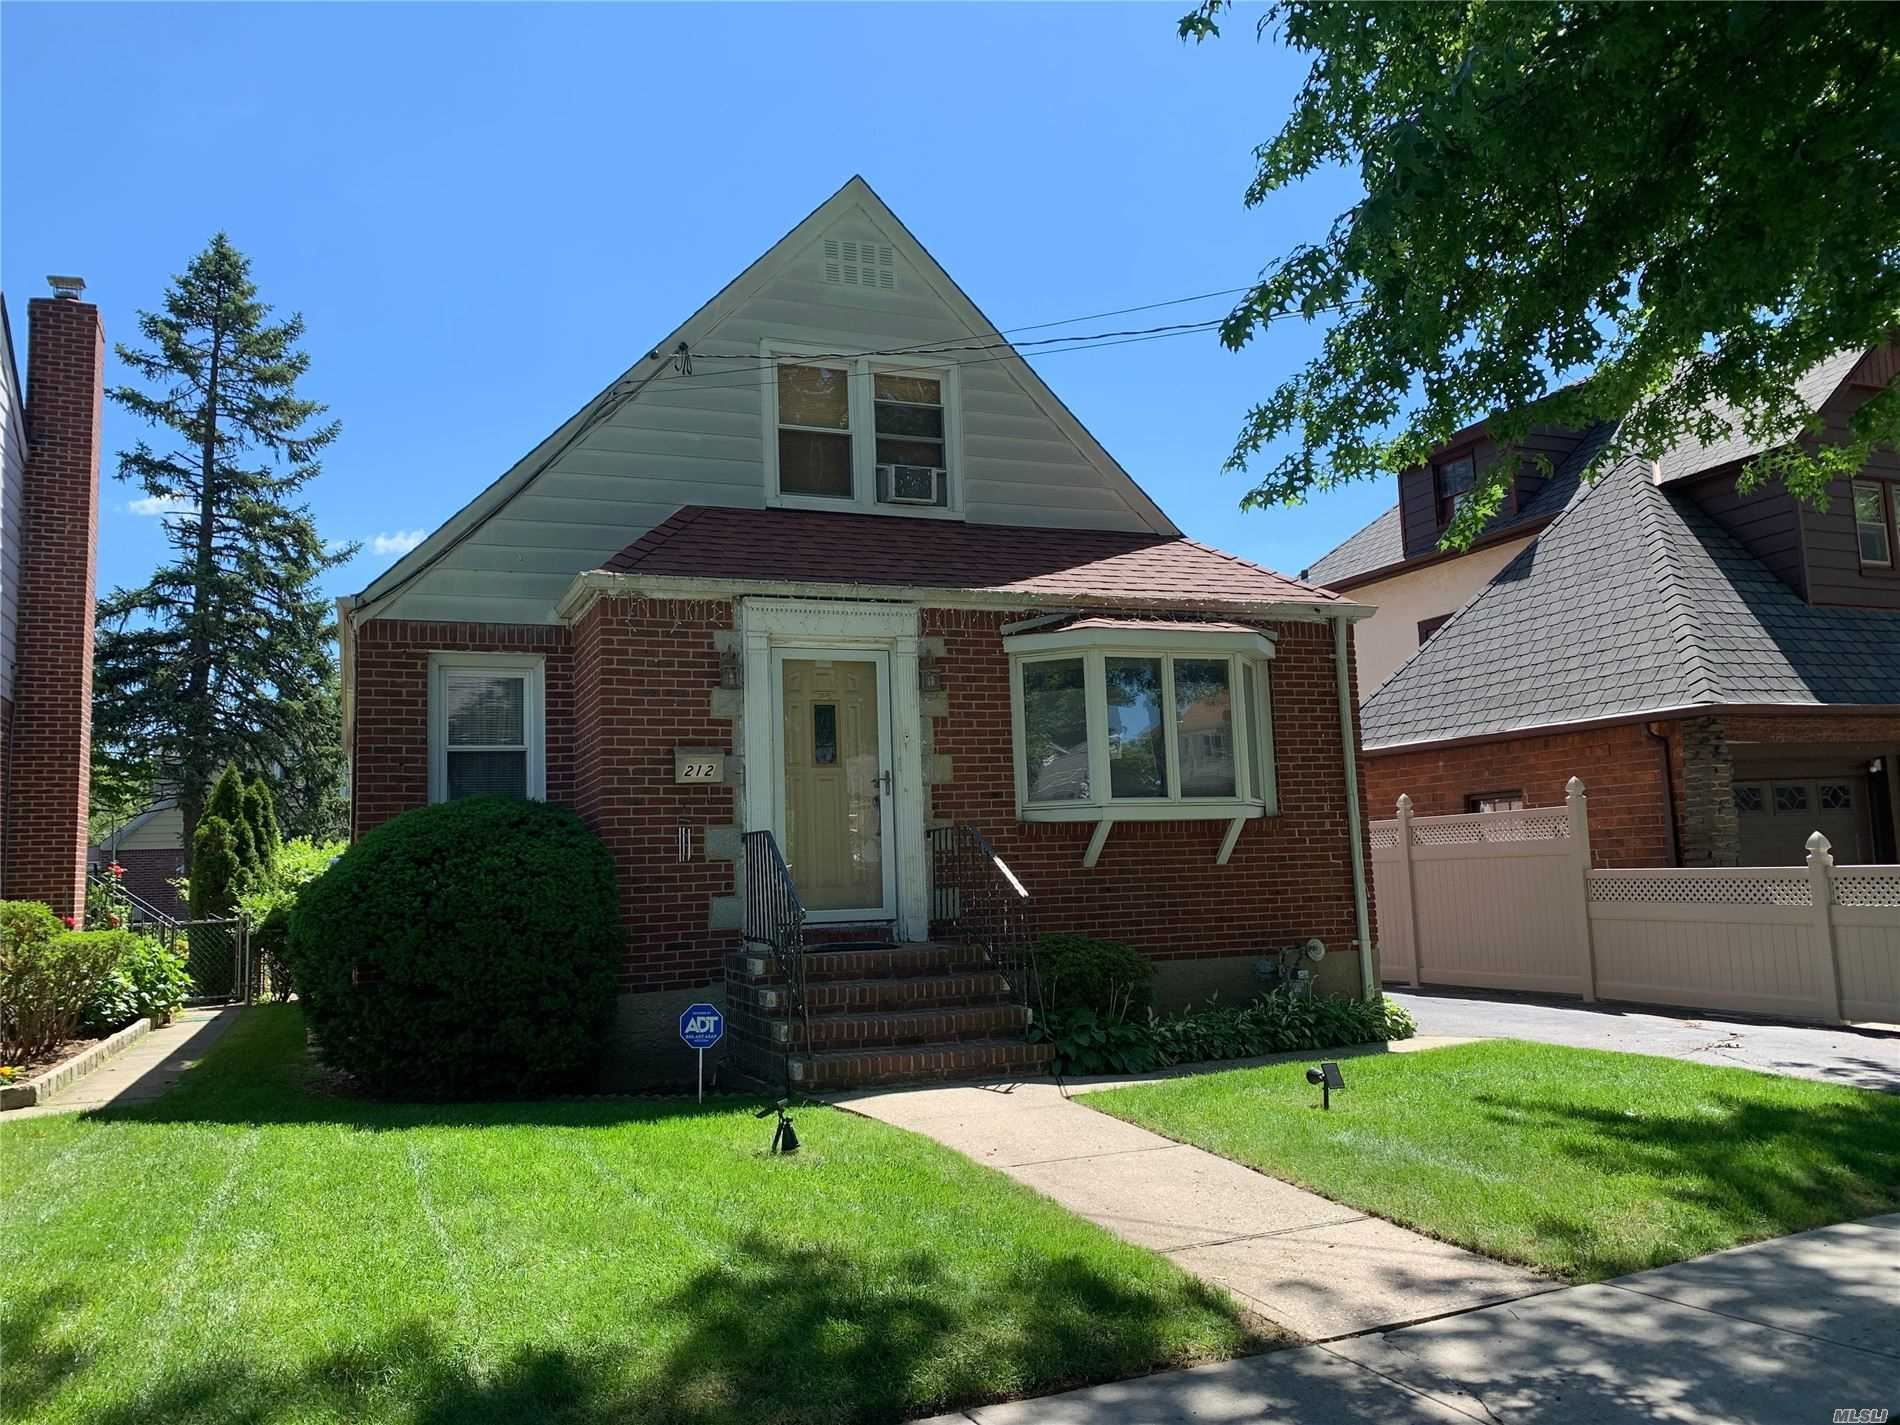 212 Ingraham Lane, New Hyde Park, NY 11040 - MLS#: 3225385